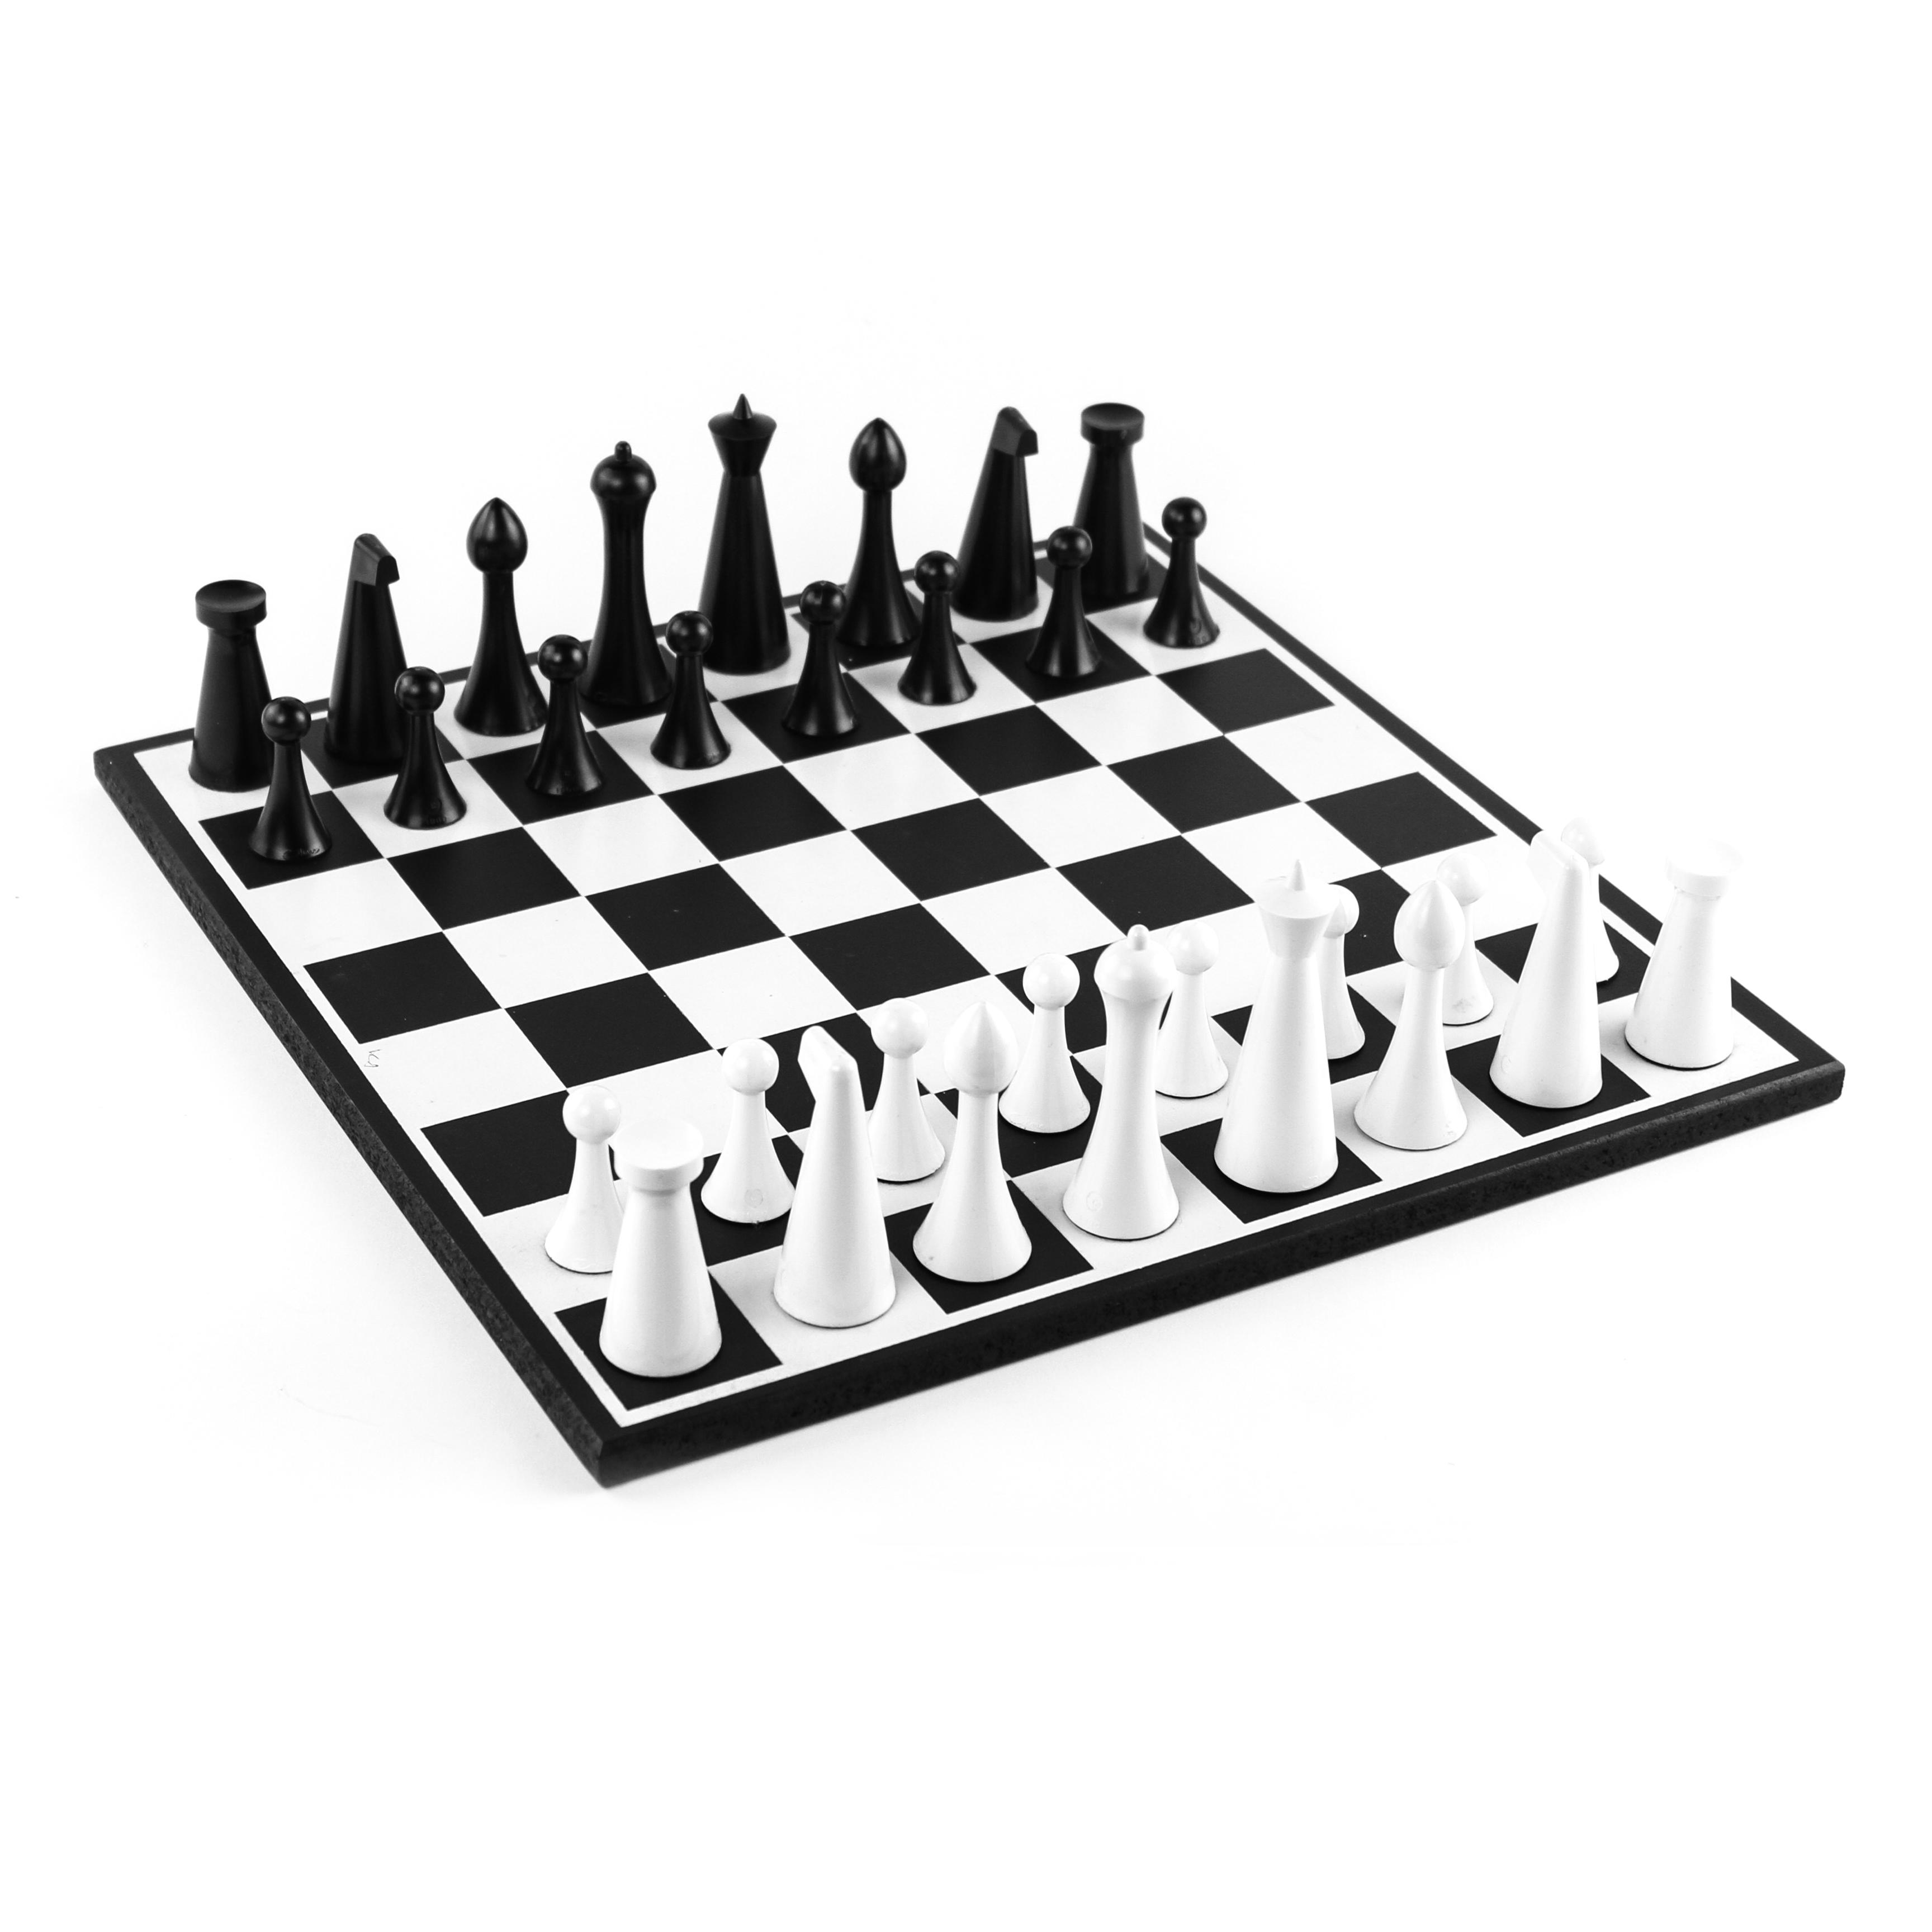 Huckberry Mid-Century Chess Set | Huckberry